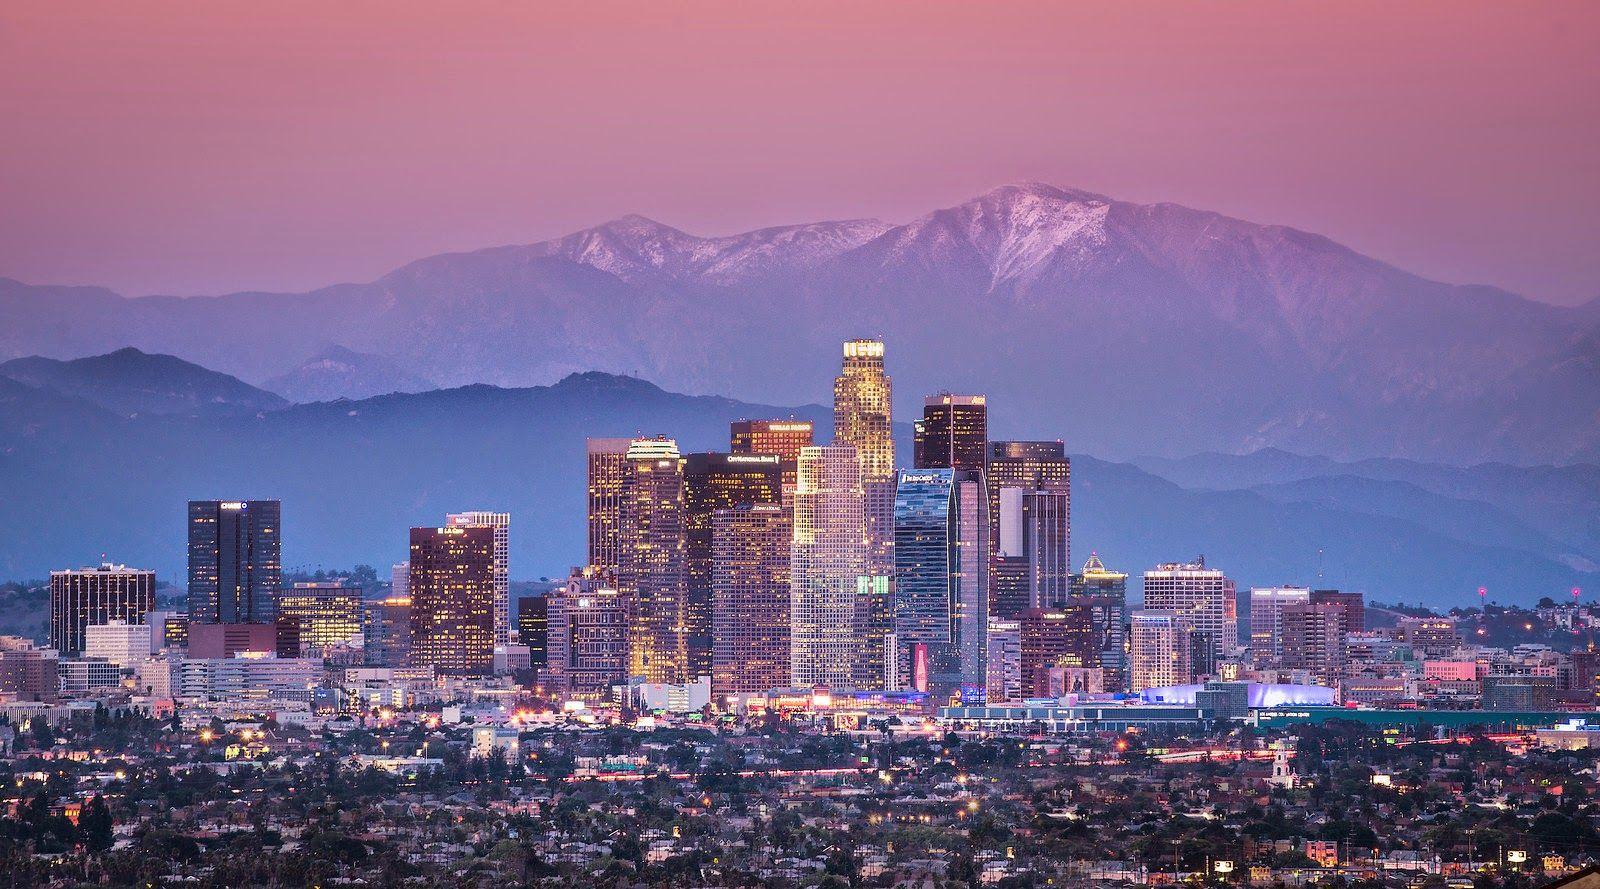 Los Angeles Skyline 1980 39 S 2019 Blade Runner Prediction And Los Angeles Skyline Skyline Mount Baldy